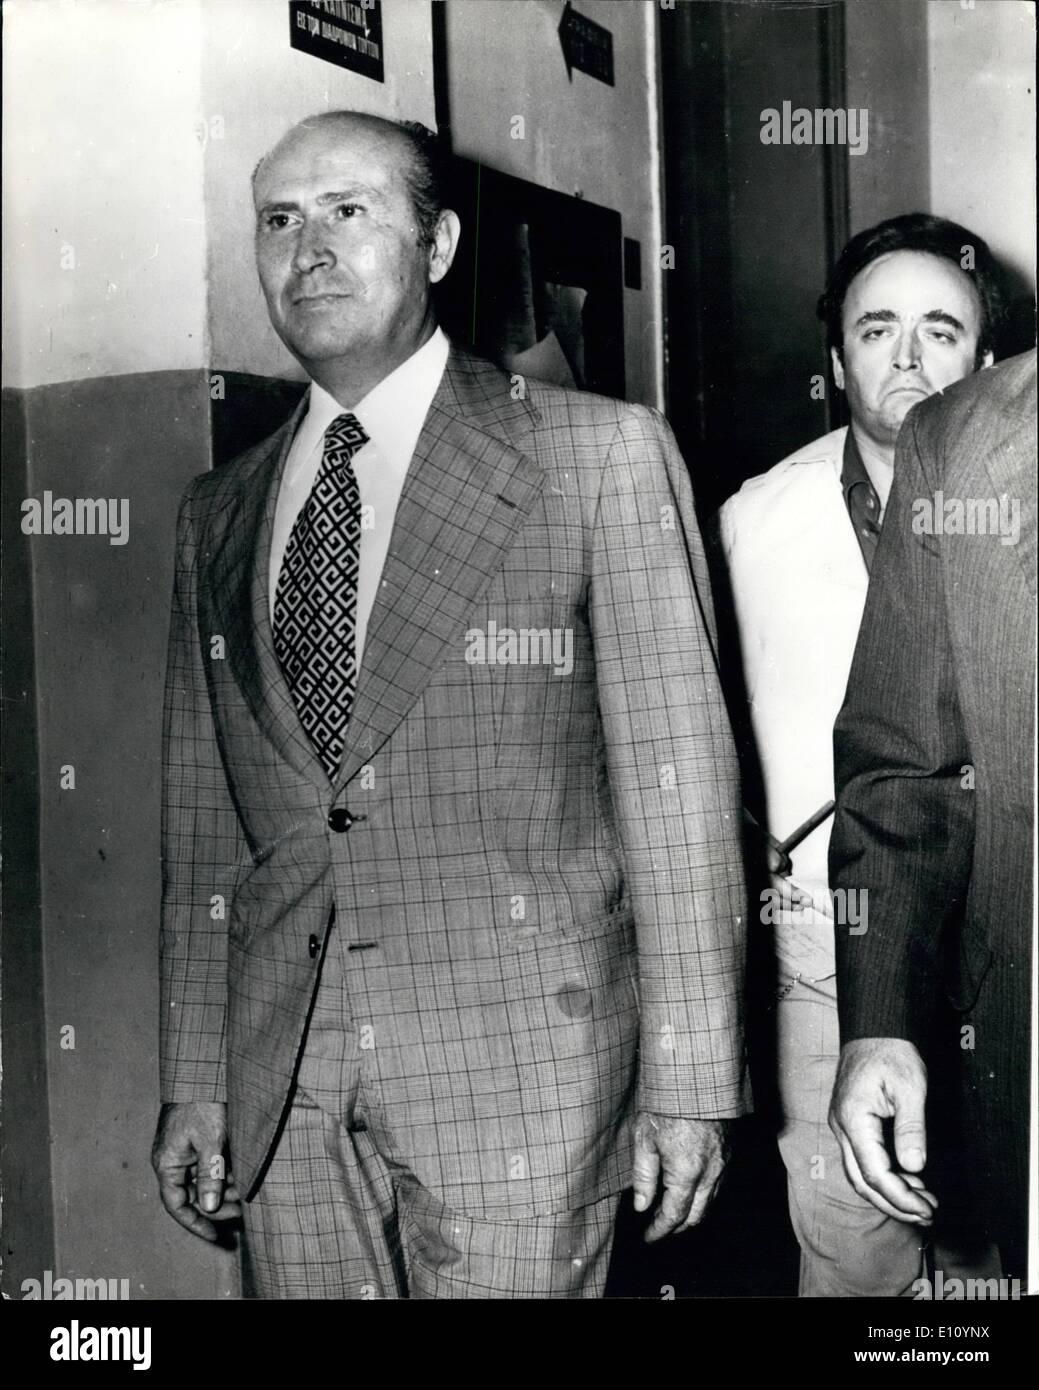 Sep. 09, 1974 - Ioannides flees Athens Mob: Former strongman of the Greek junta, Brig. Dimitrios Ioannides, had - Stock Image